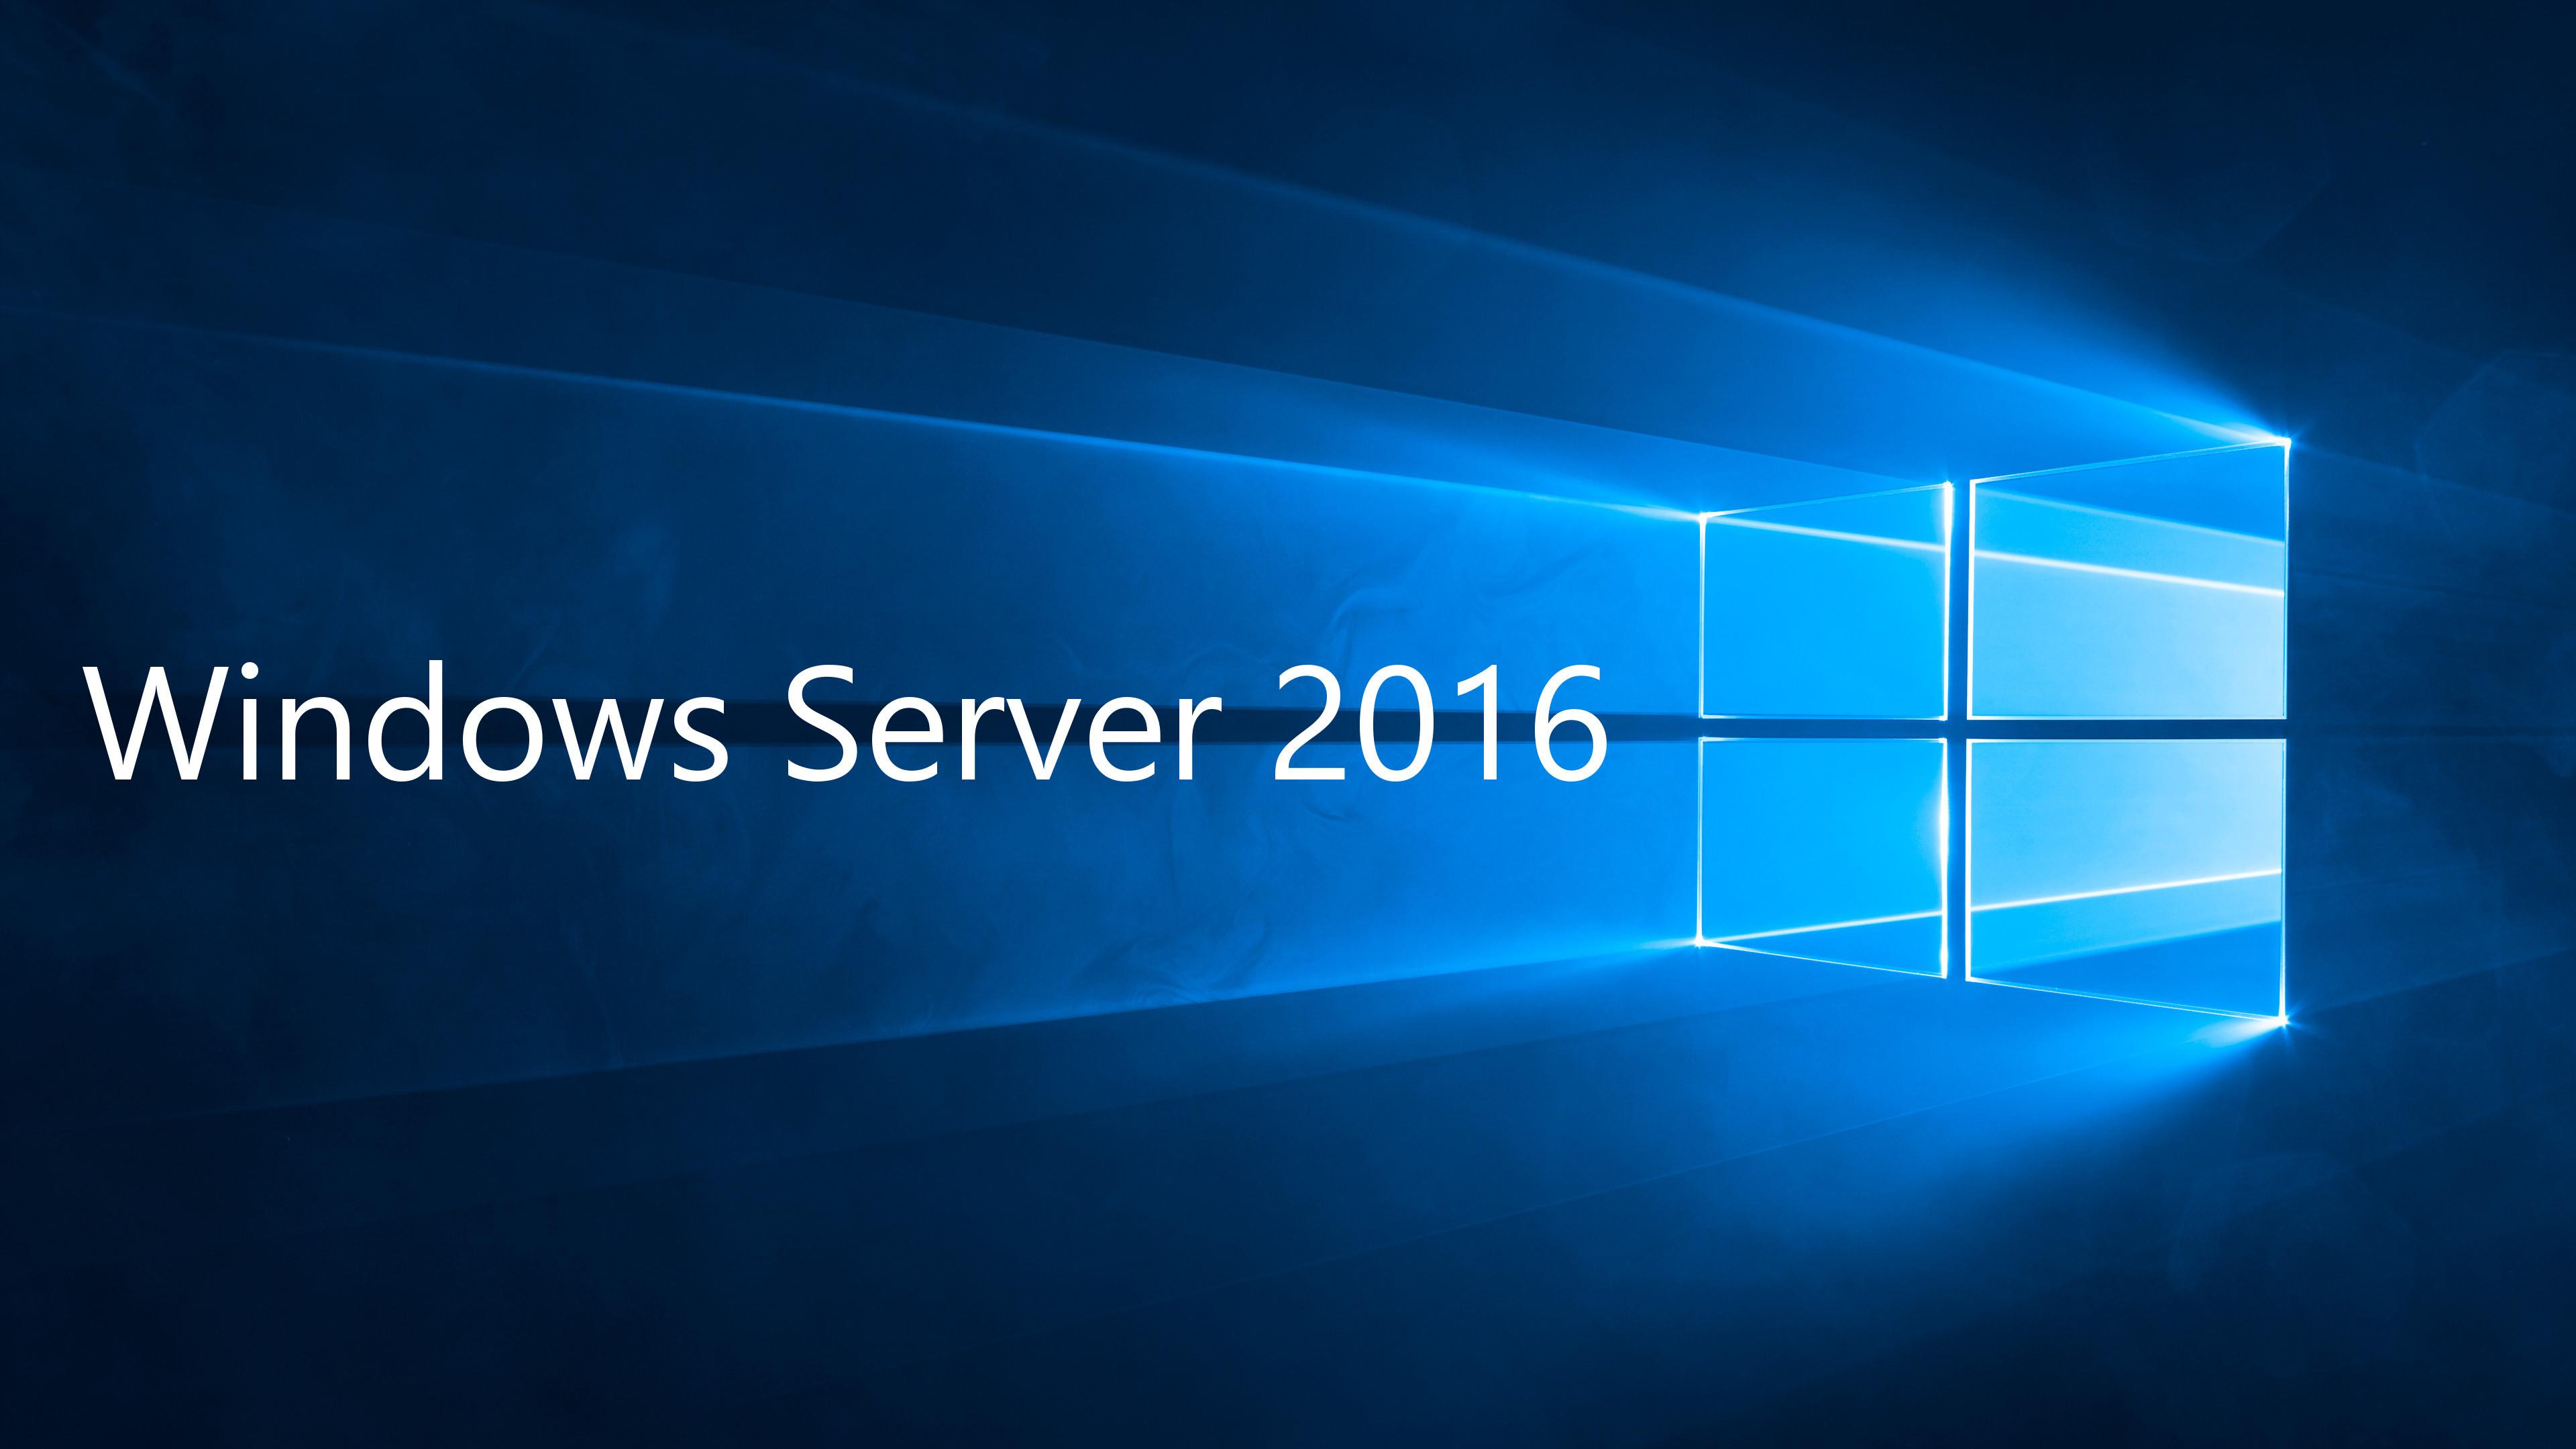 Windows Server Wallpaper 1